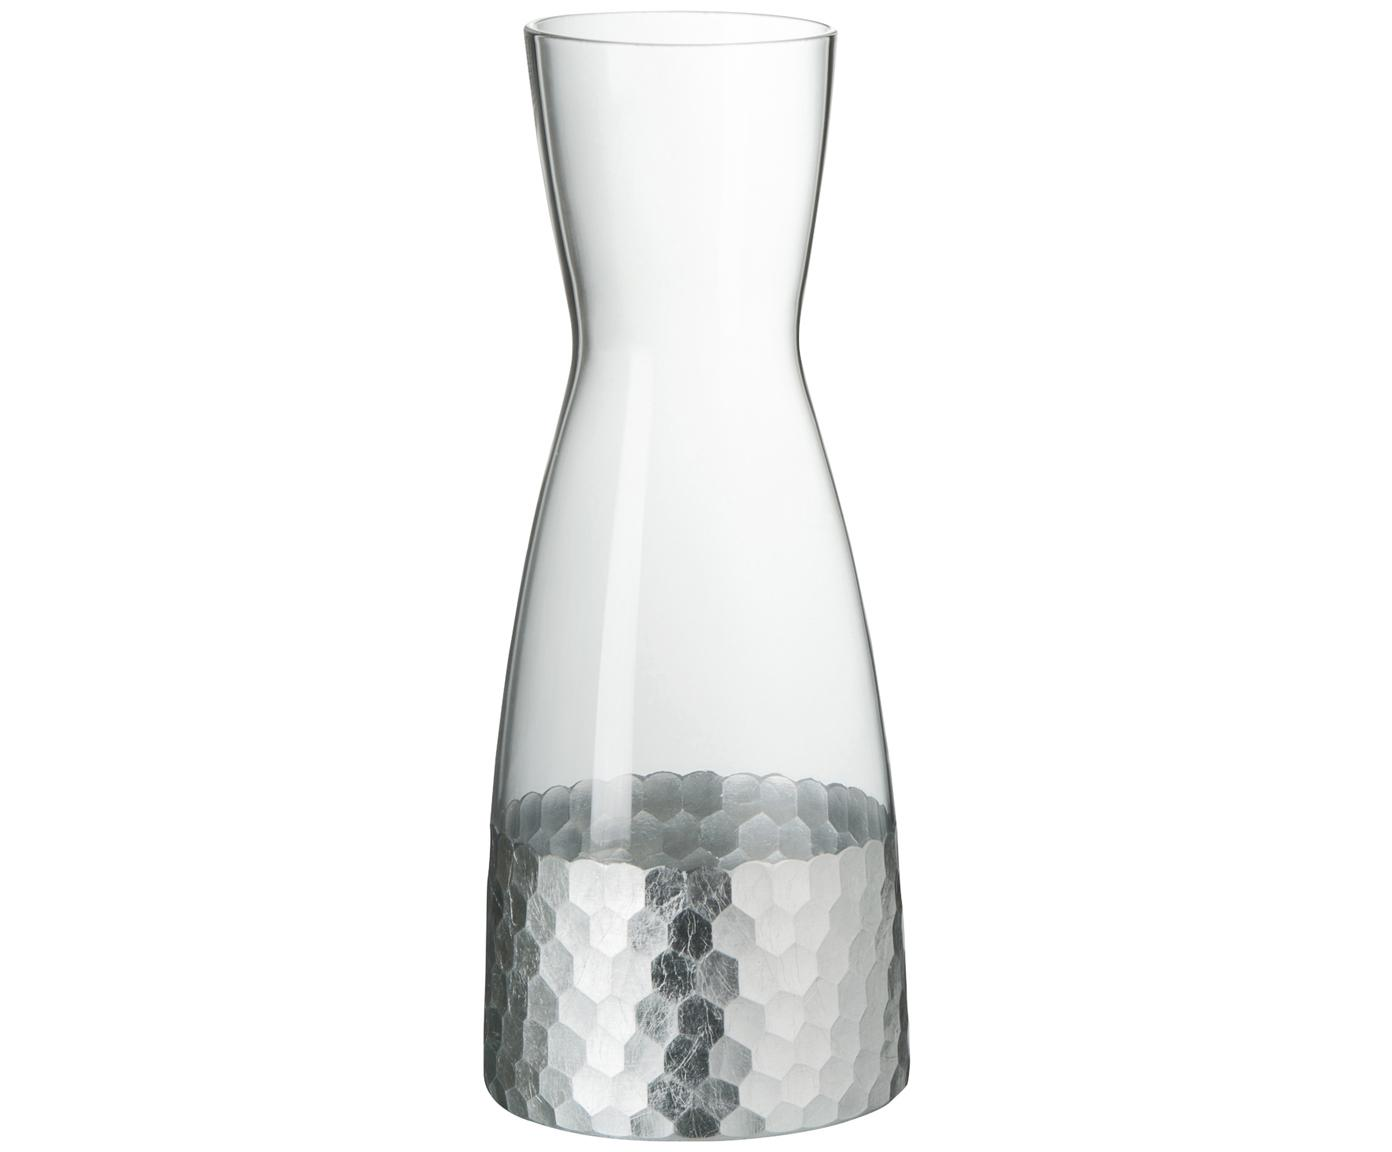 Karaffe Wasp, Glas, Transparent, Silber-Grau, 1.15 L